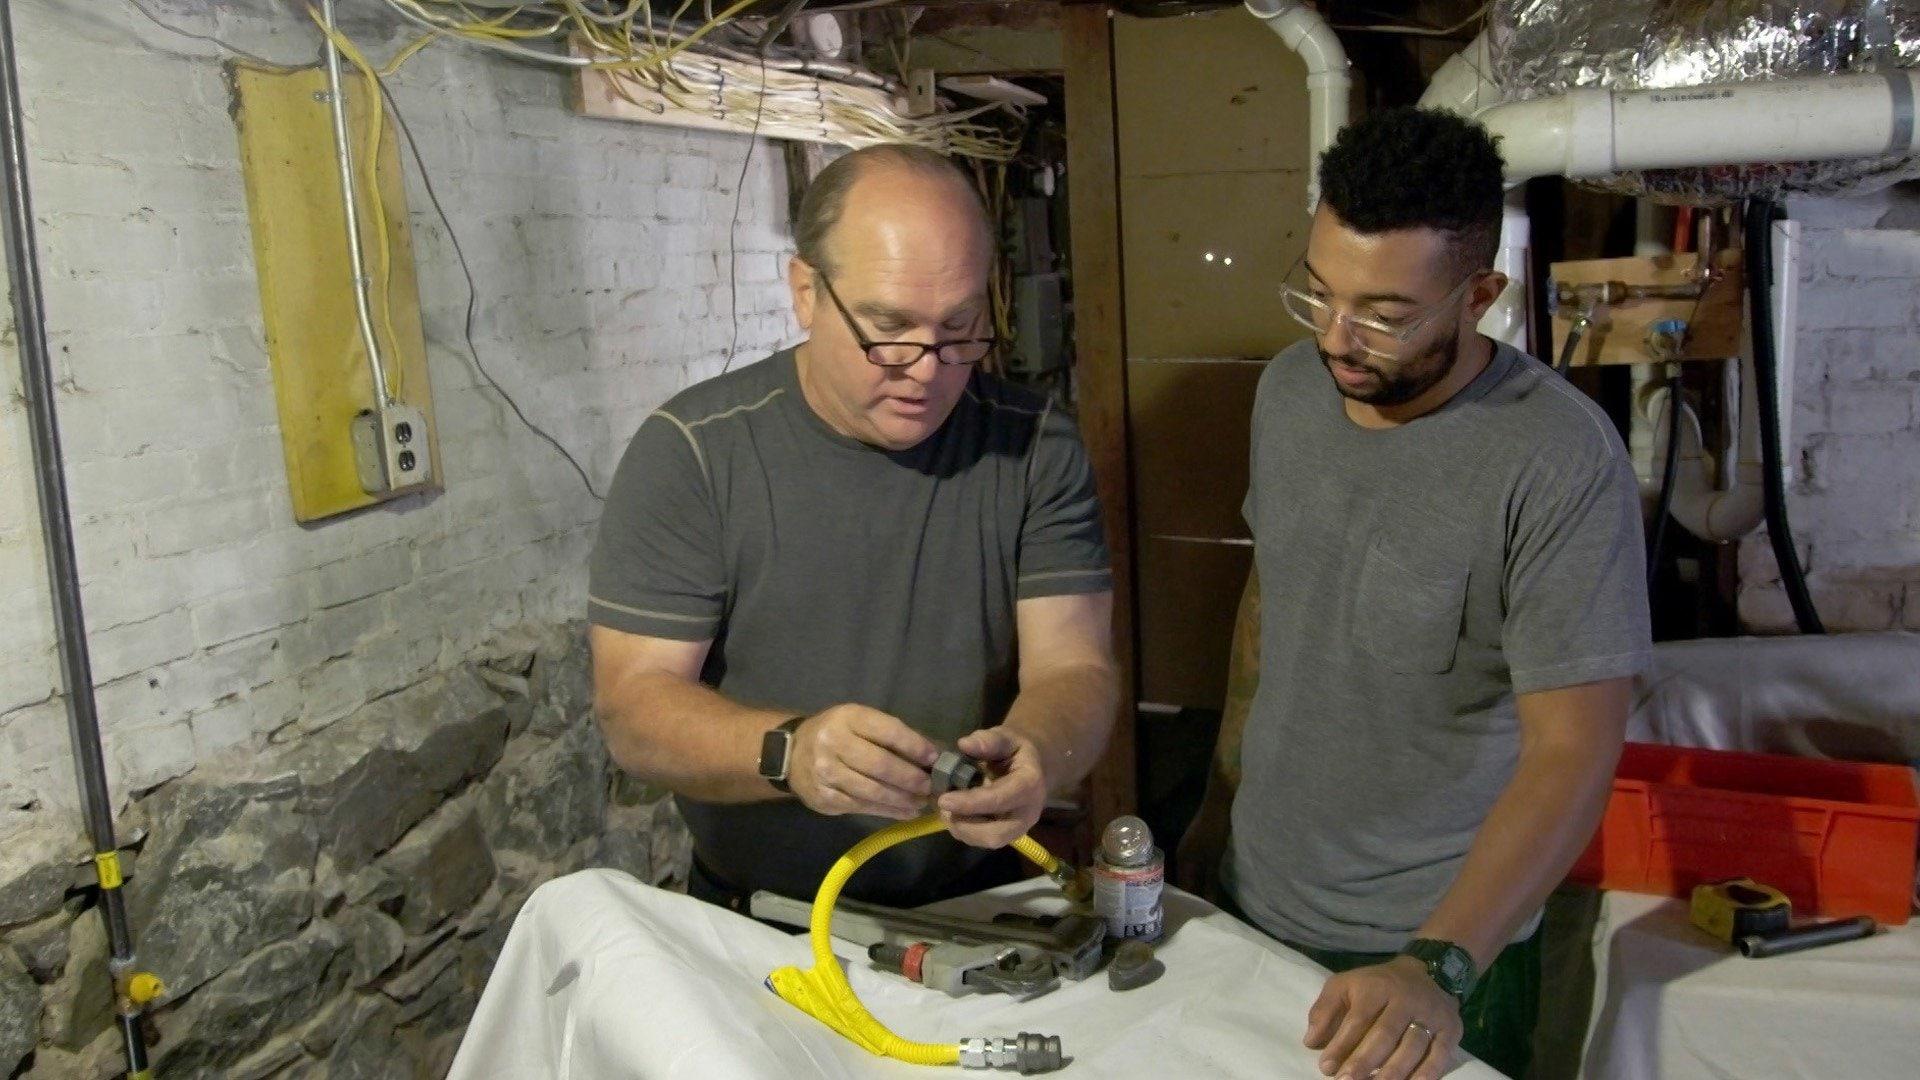 Stucco Repair; Gas Dryer